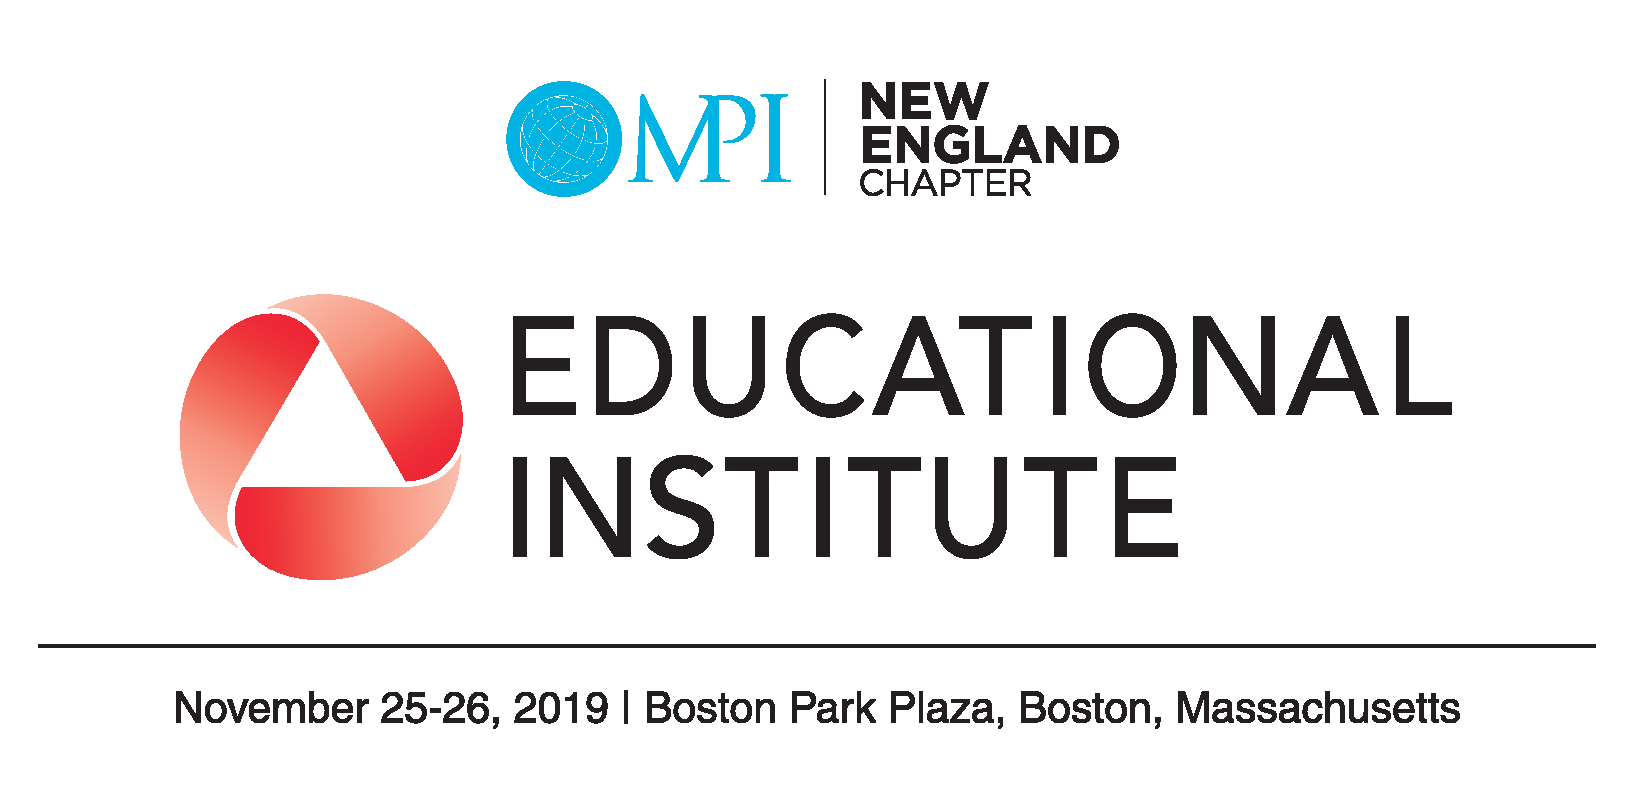 mpine_ed_institute_logo_2019